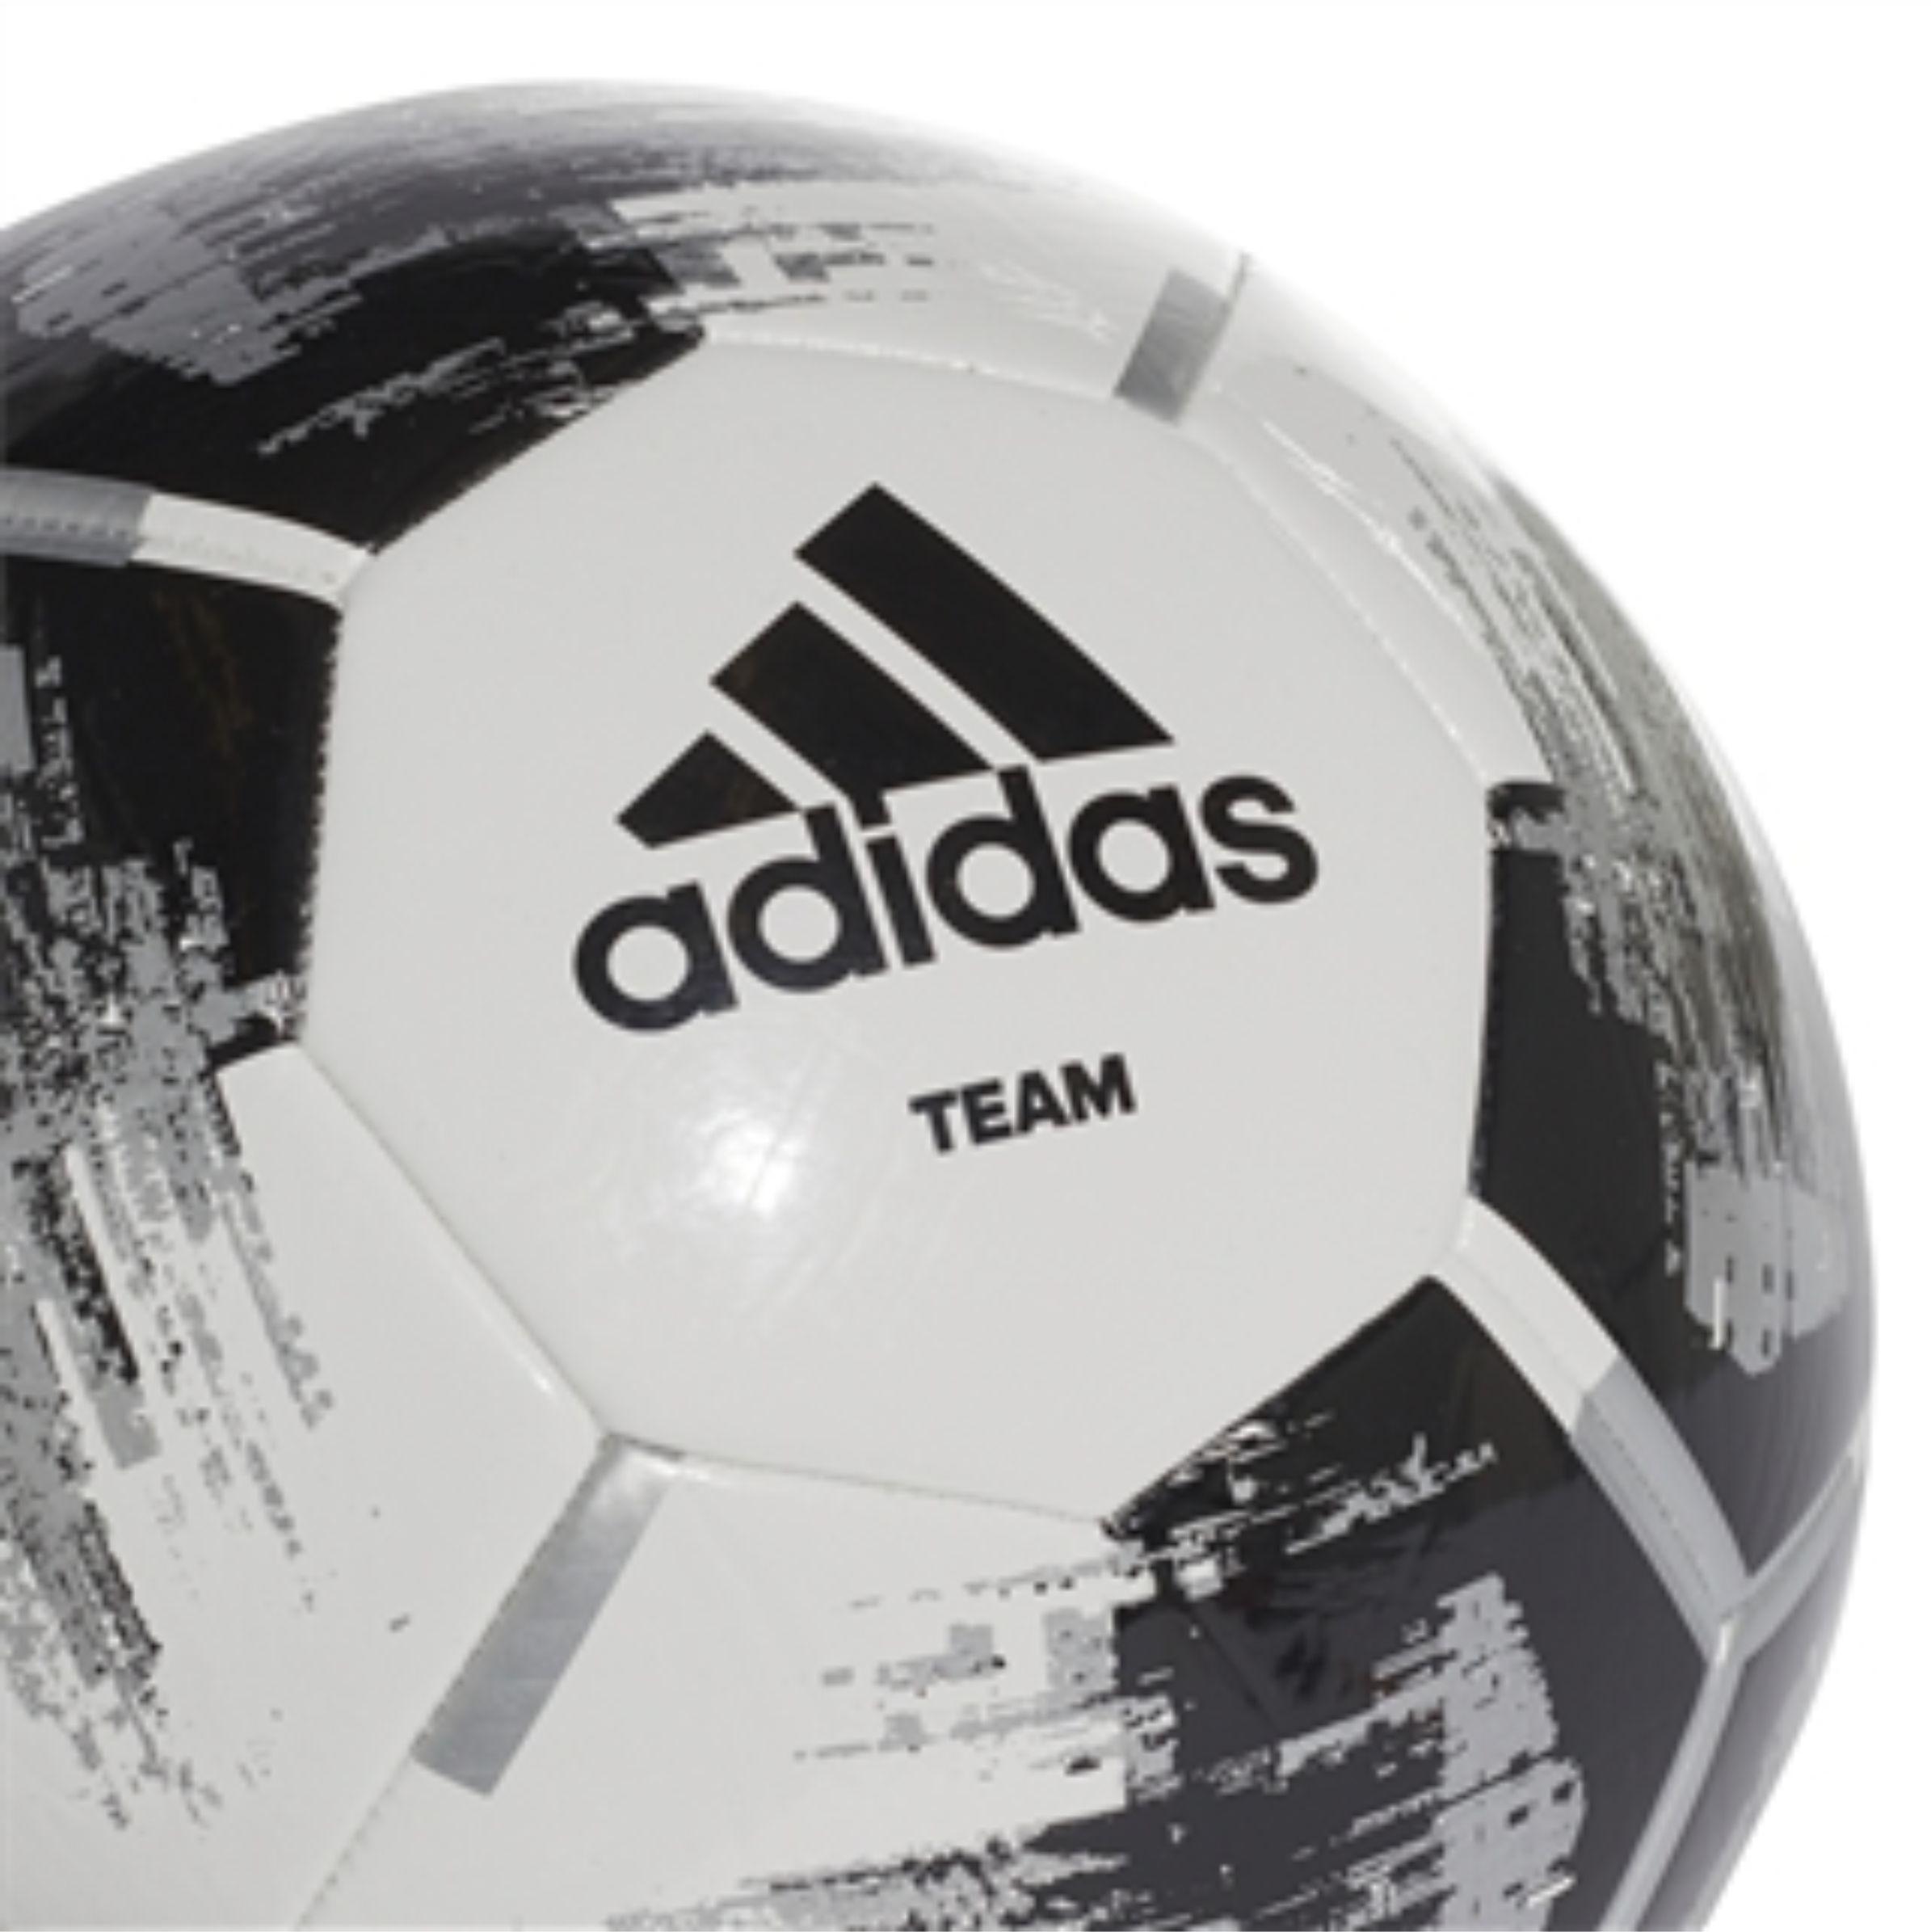 Adidas Footballs x 10. £75.00. Adidas Team Glider Football 714faaddd8